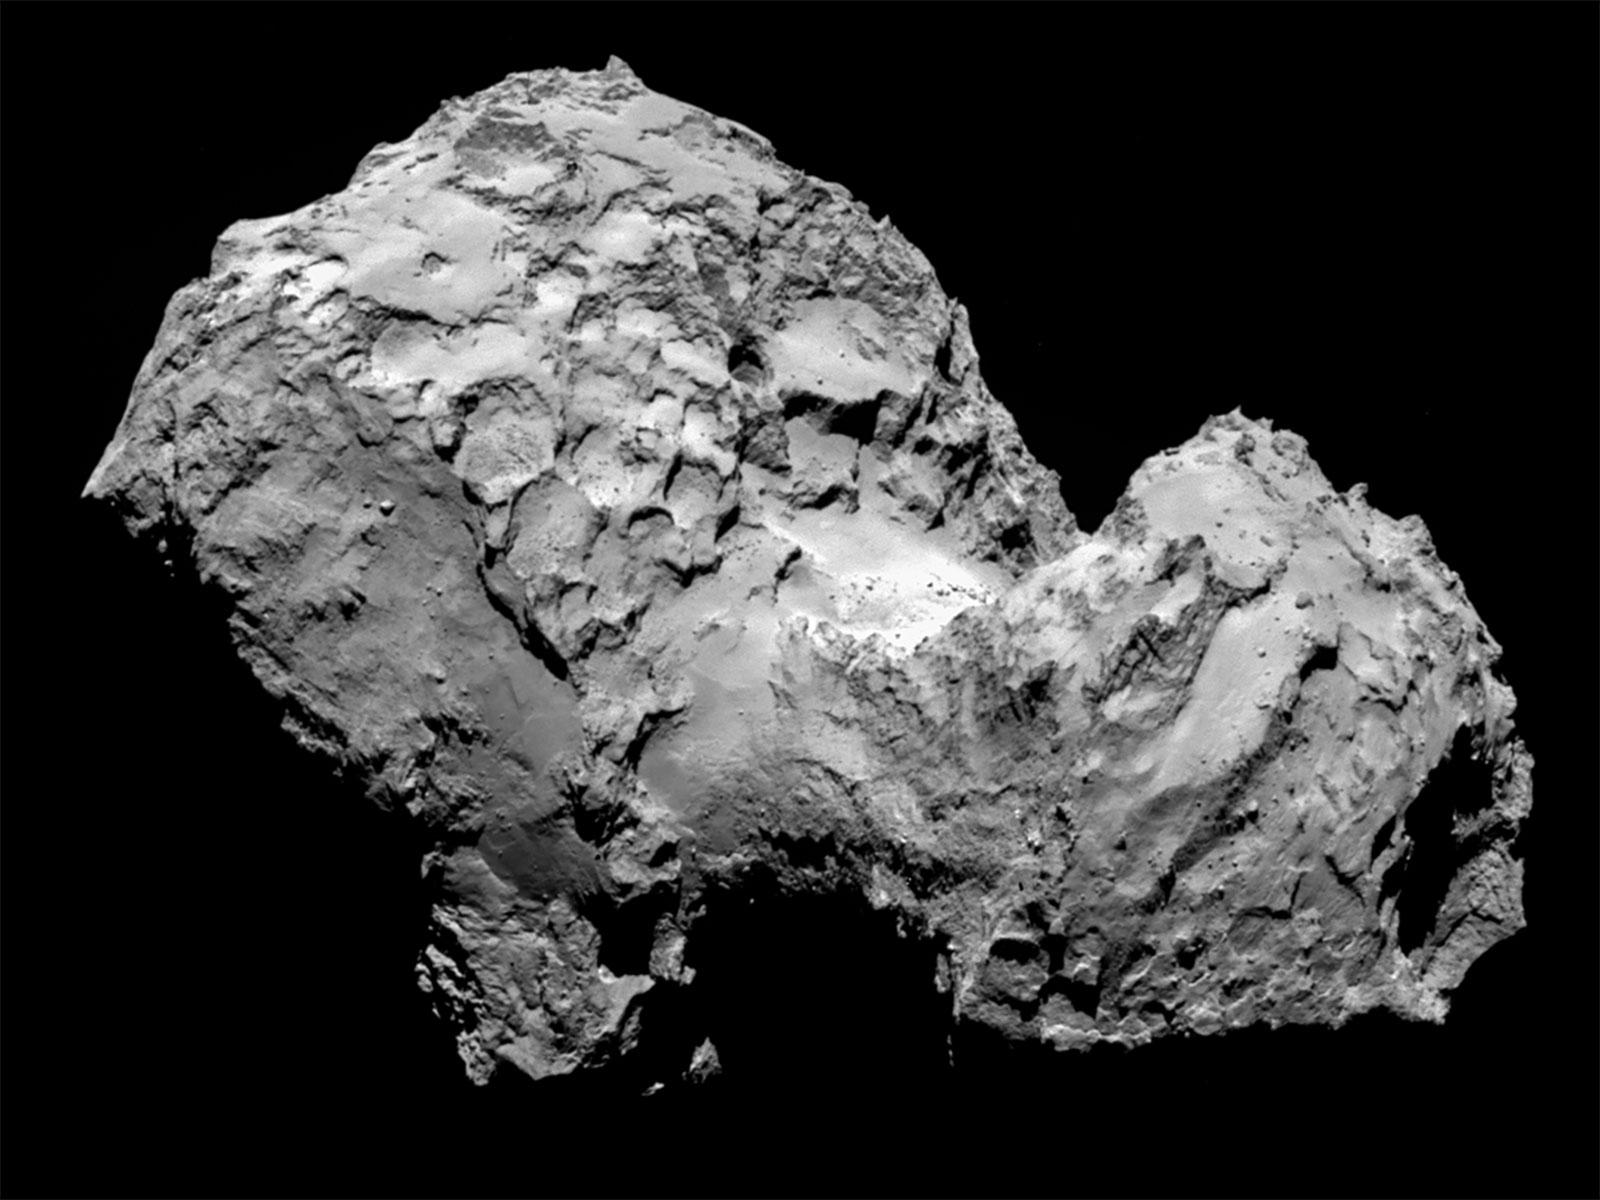 Credit: ESA/Rosetta/MPS for OSIRIS Team